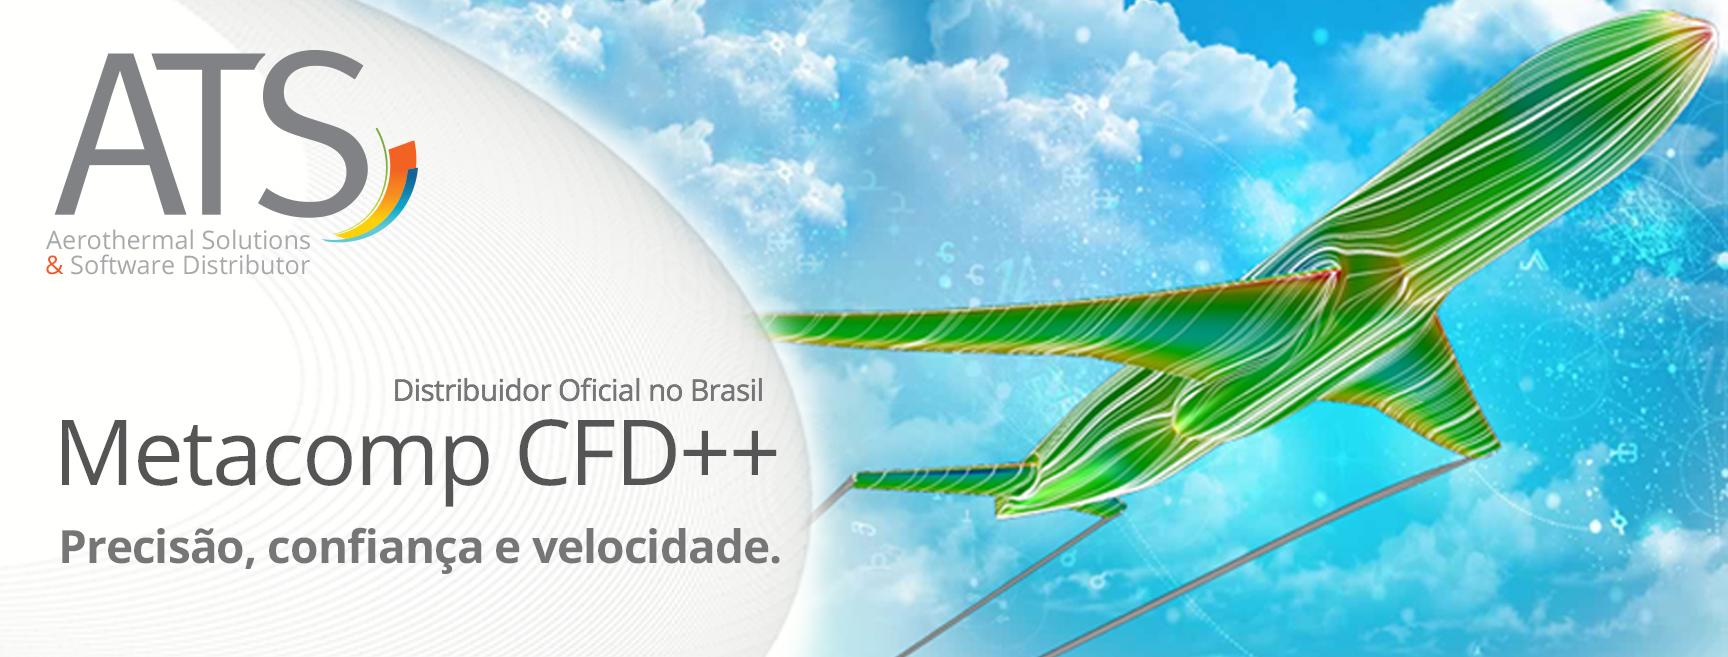 ATS - Aerothermal Solutions, Distribuidor Exclusivo Metacomp no Brasil